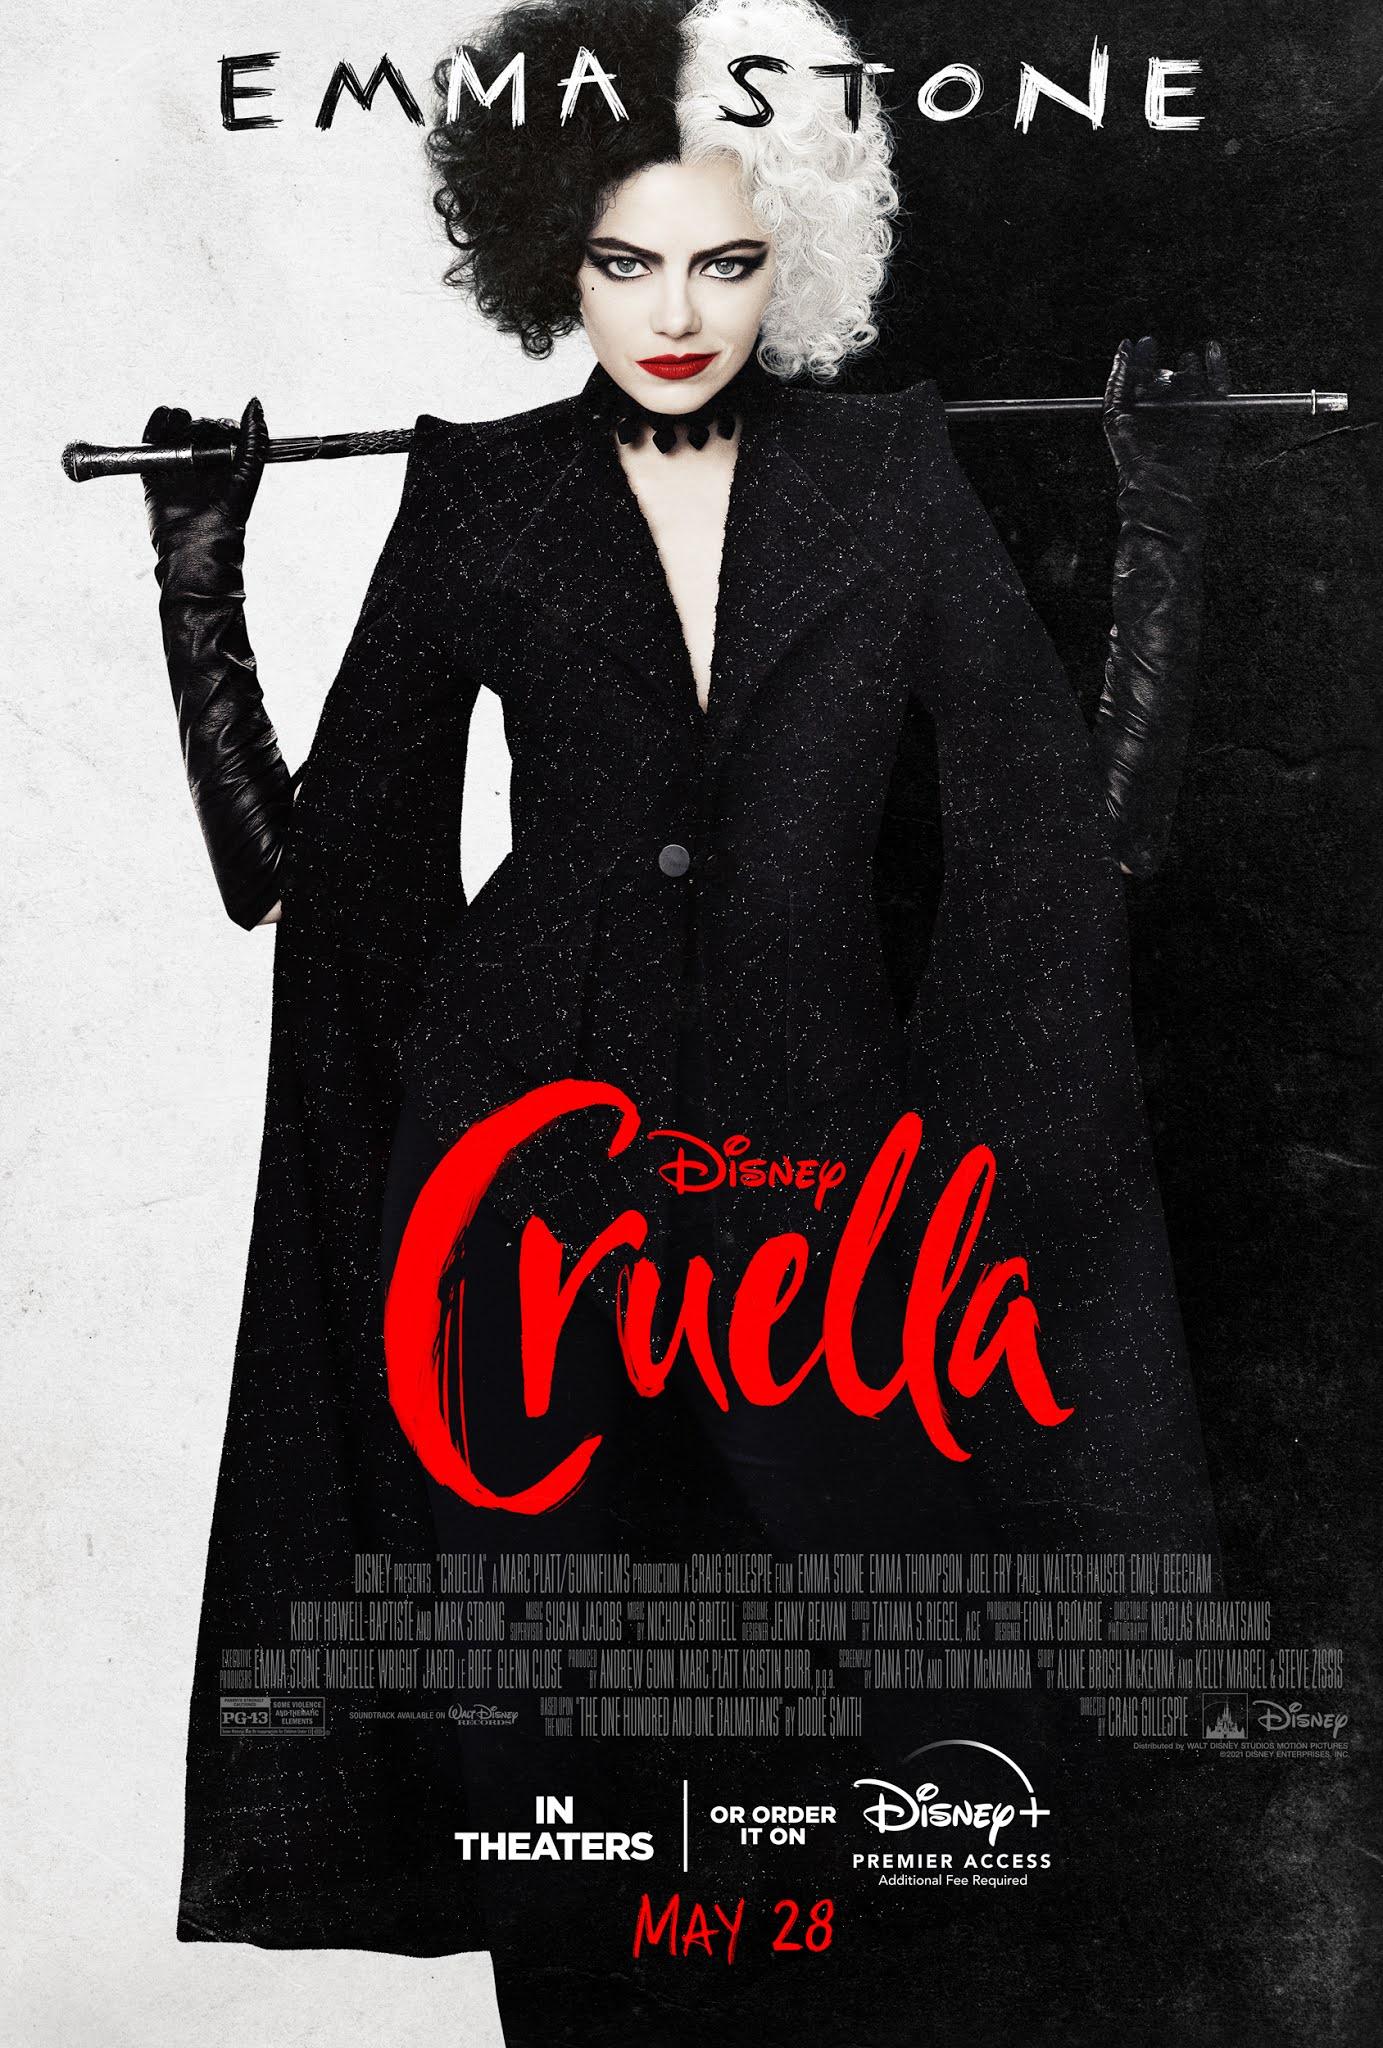 James Hornsby A Christmas Carol 2021 Cruella New Poster Trailer Sandwichjohnfilms